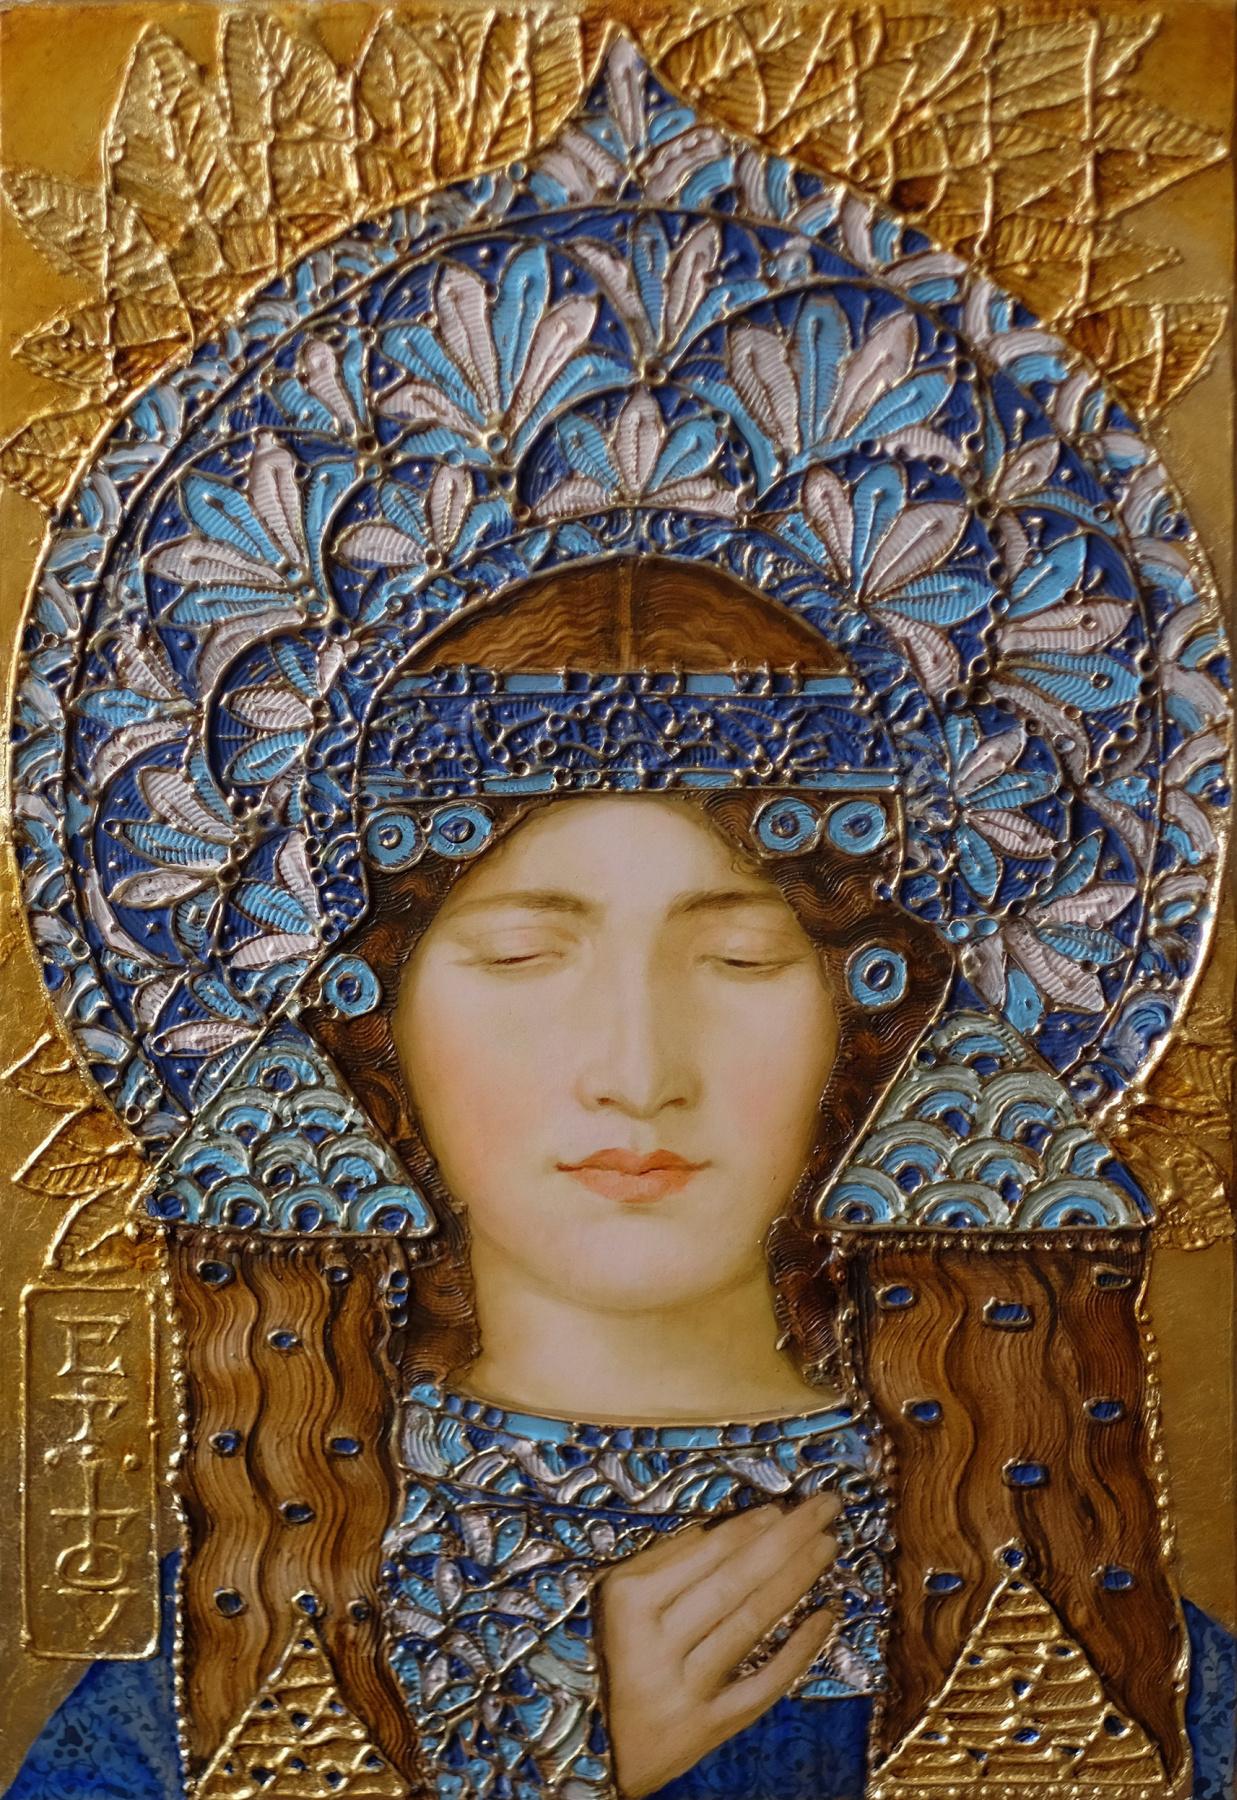 Evgeny Viktorovich Titov. Princess Autumn.